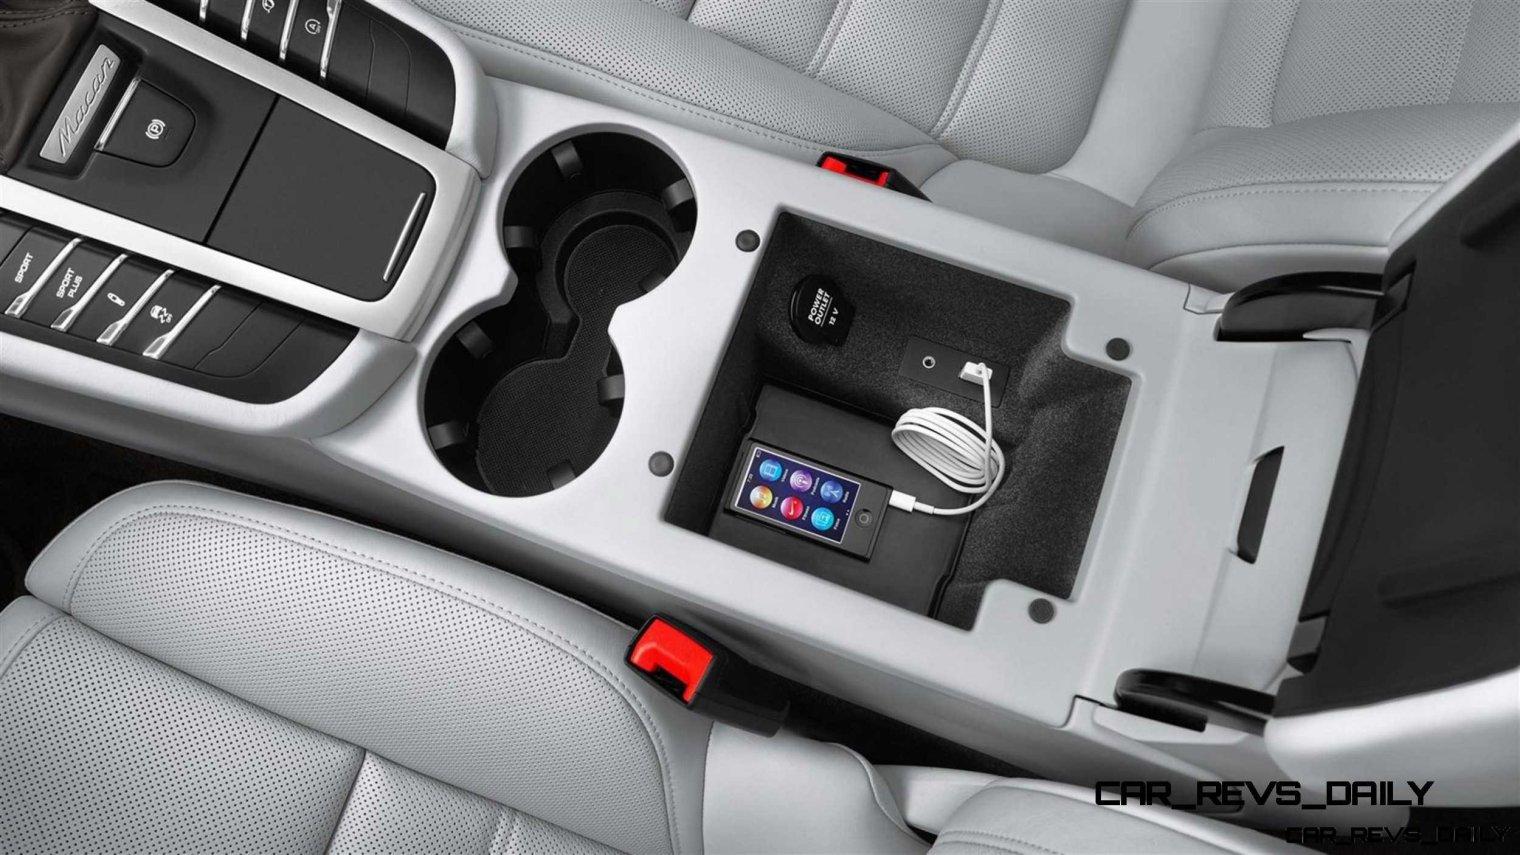 2015 Porsche Macan - Latest Images - CarRevsDaily.com 93